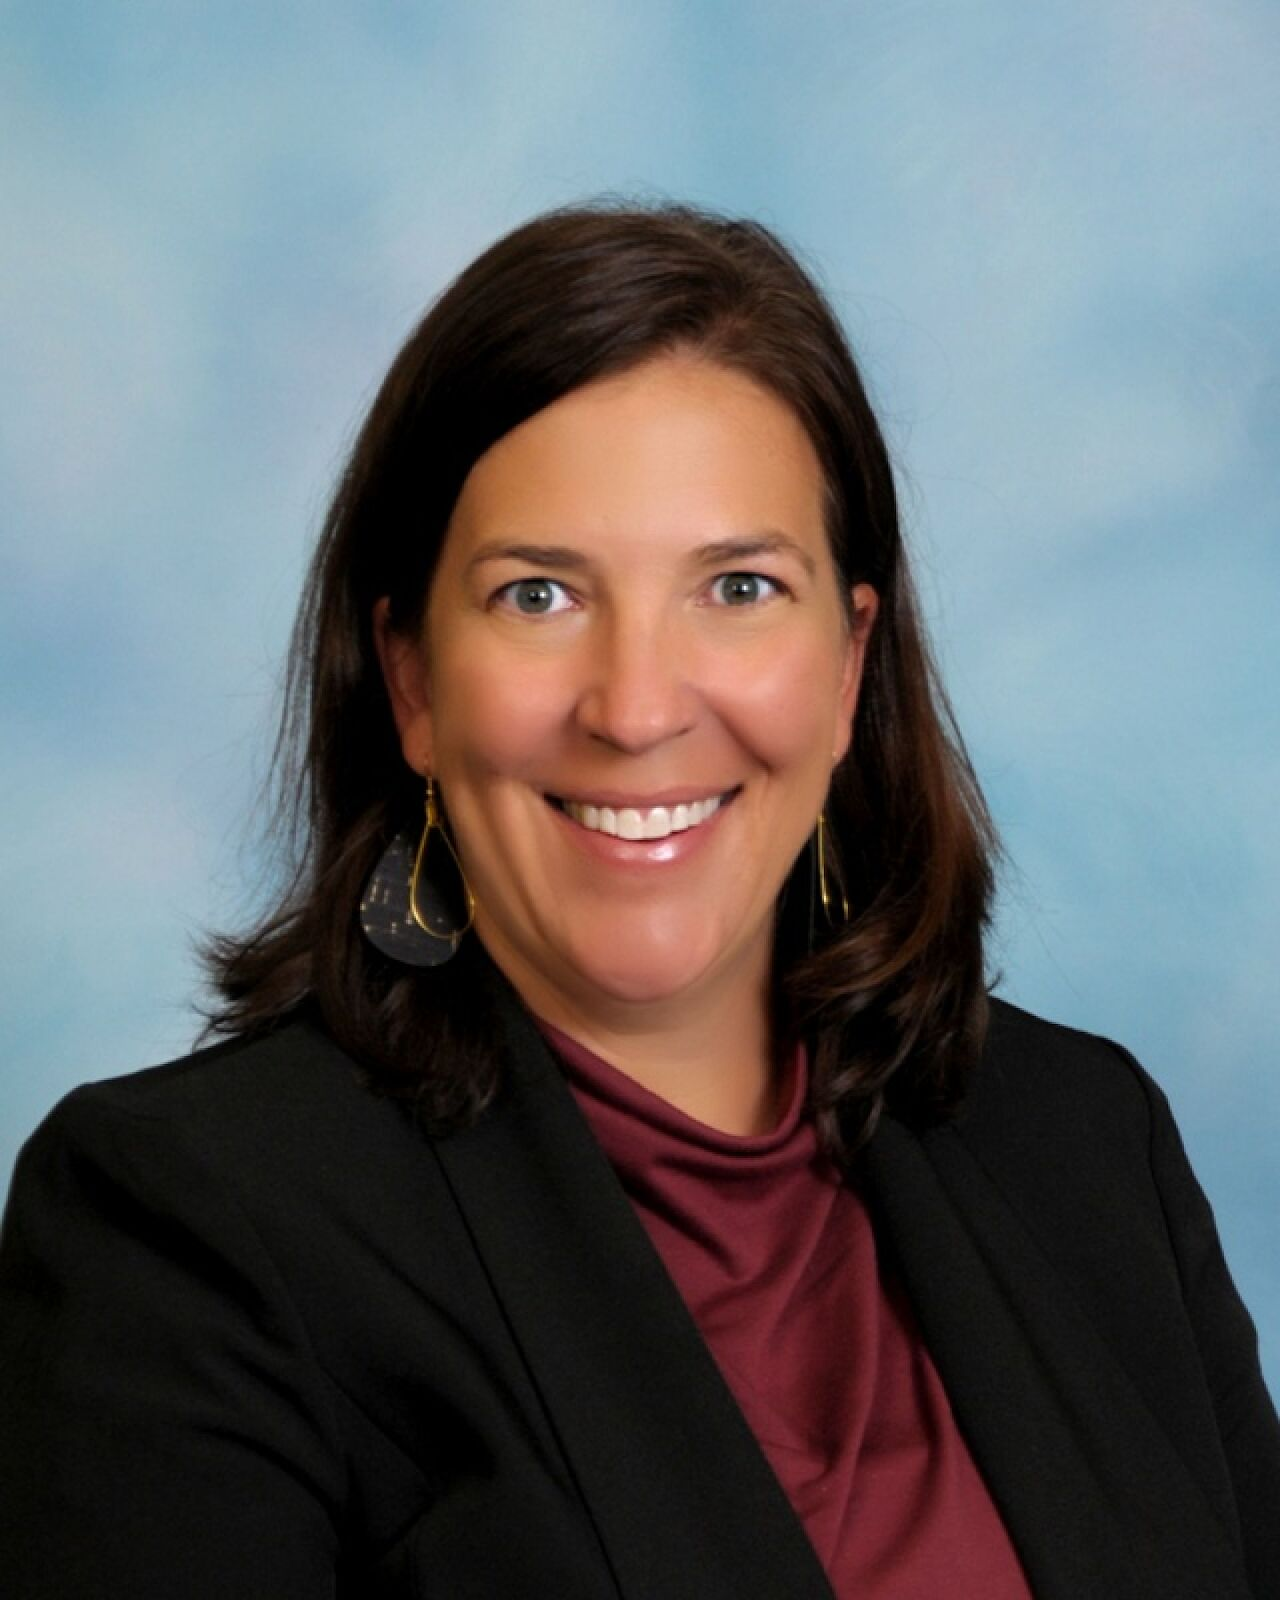 Dr. Christiana Barger